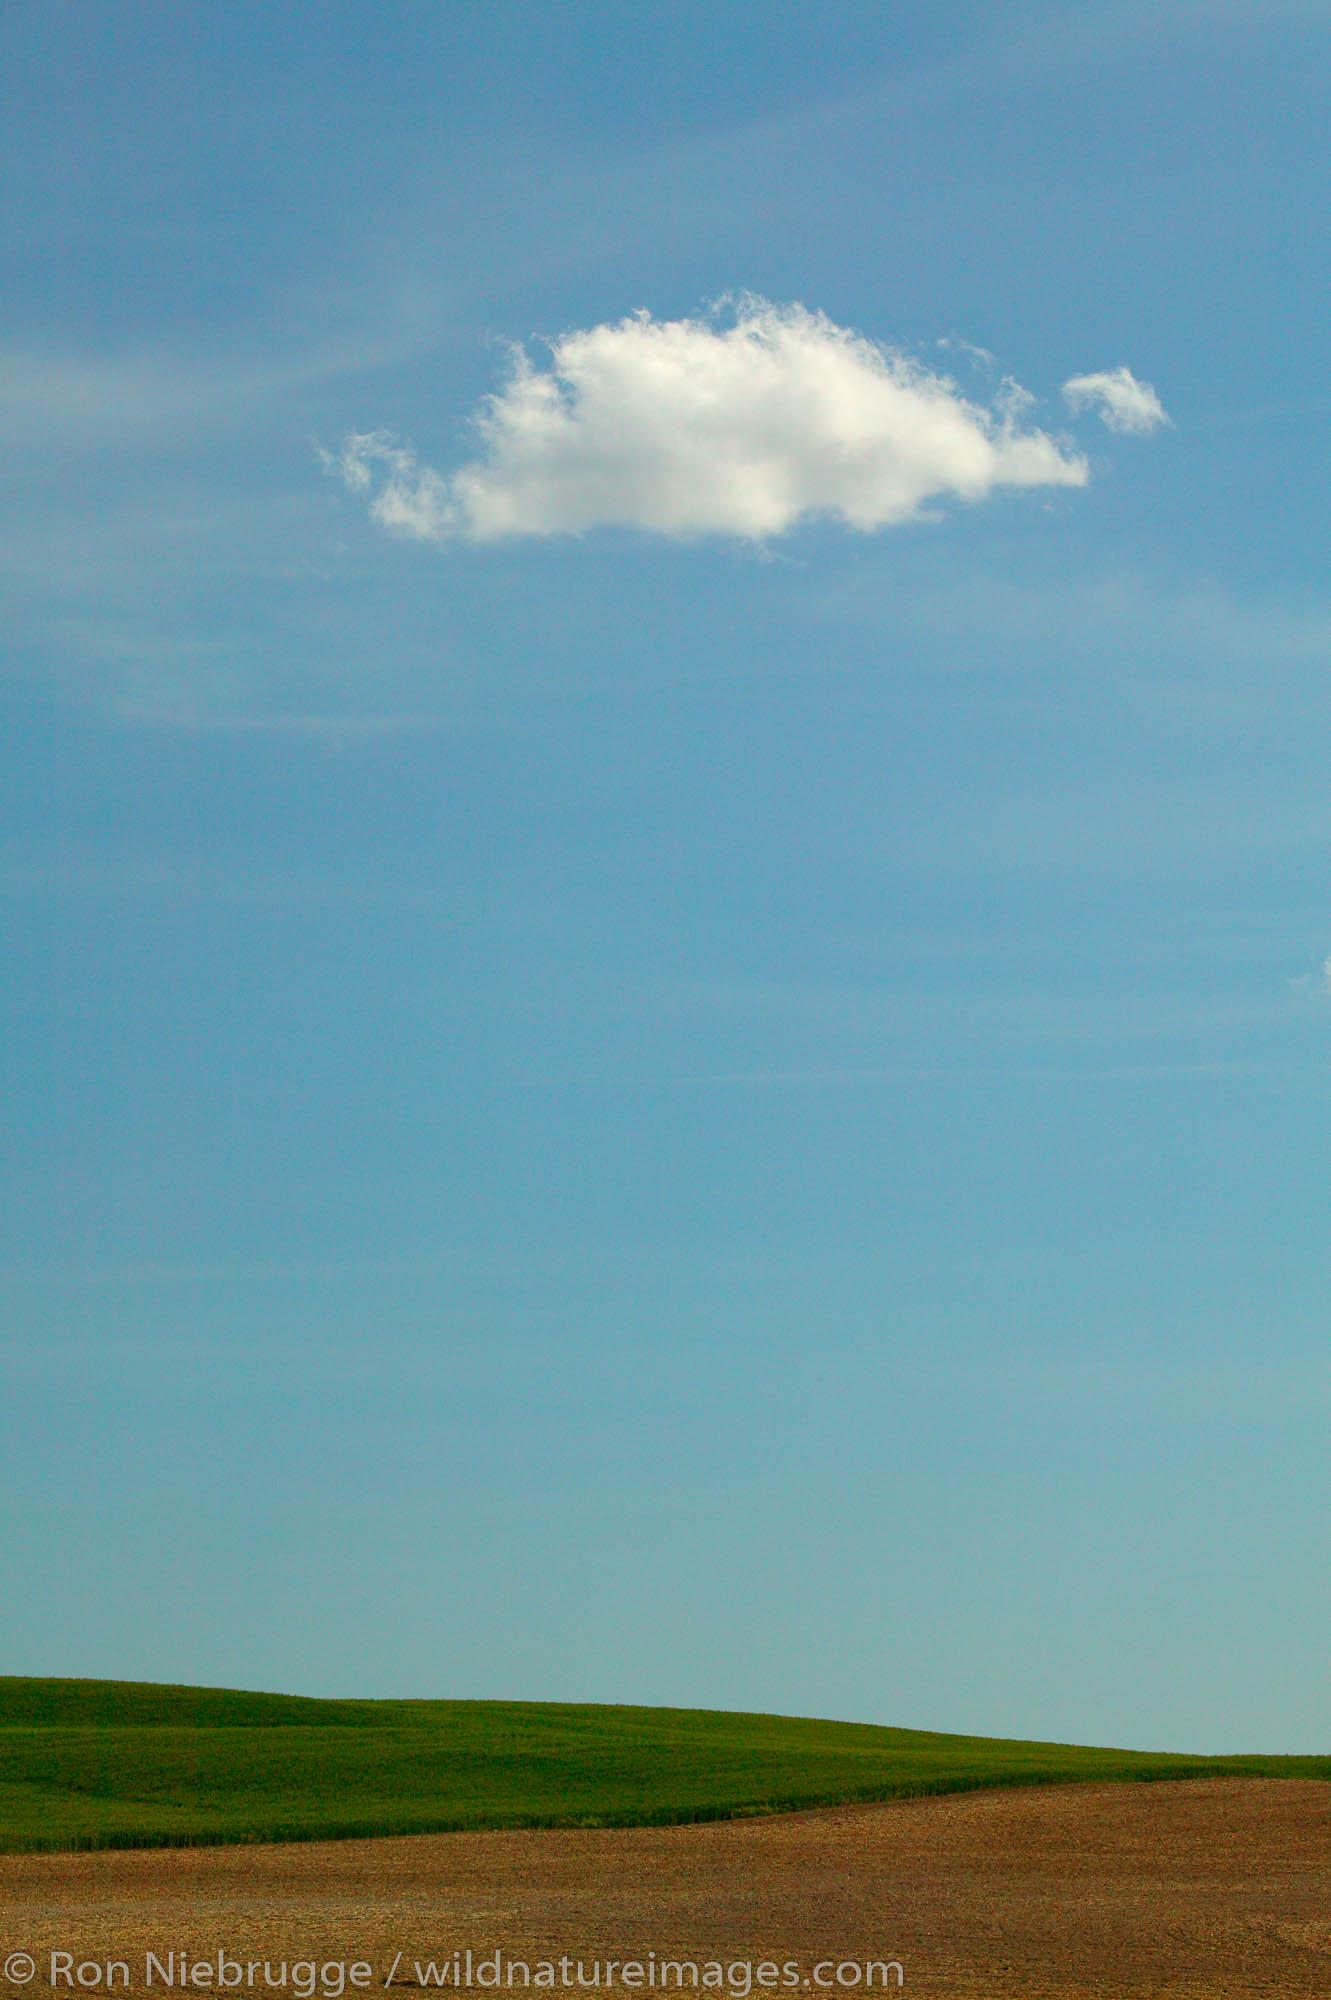 A single cloud over farmland (wheat fields) near Ritzville, Eastern Washington.